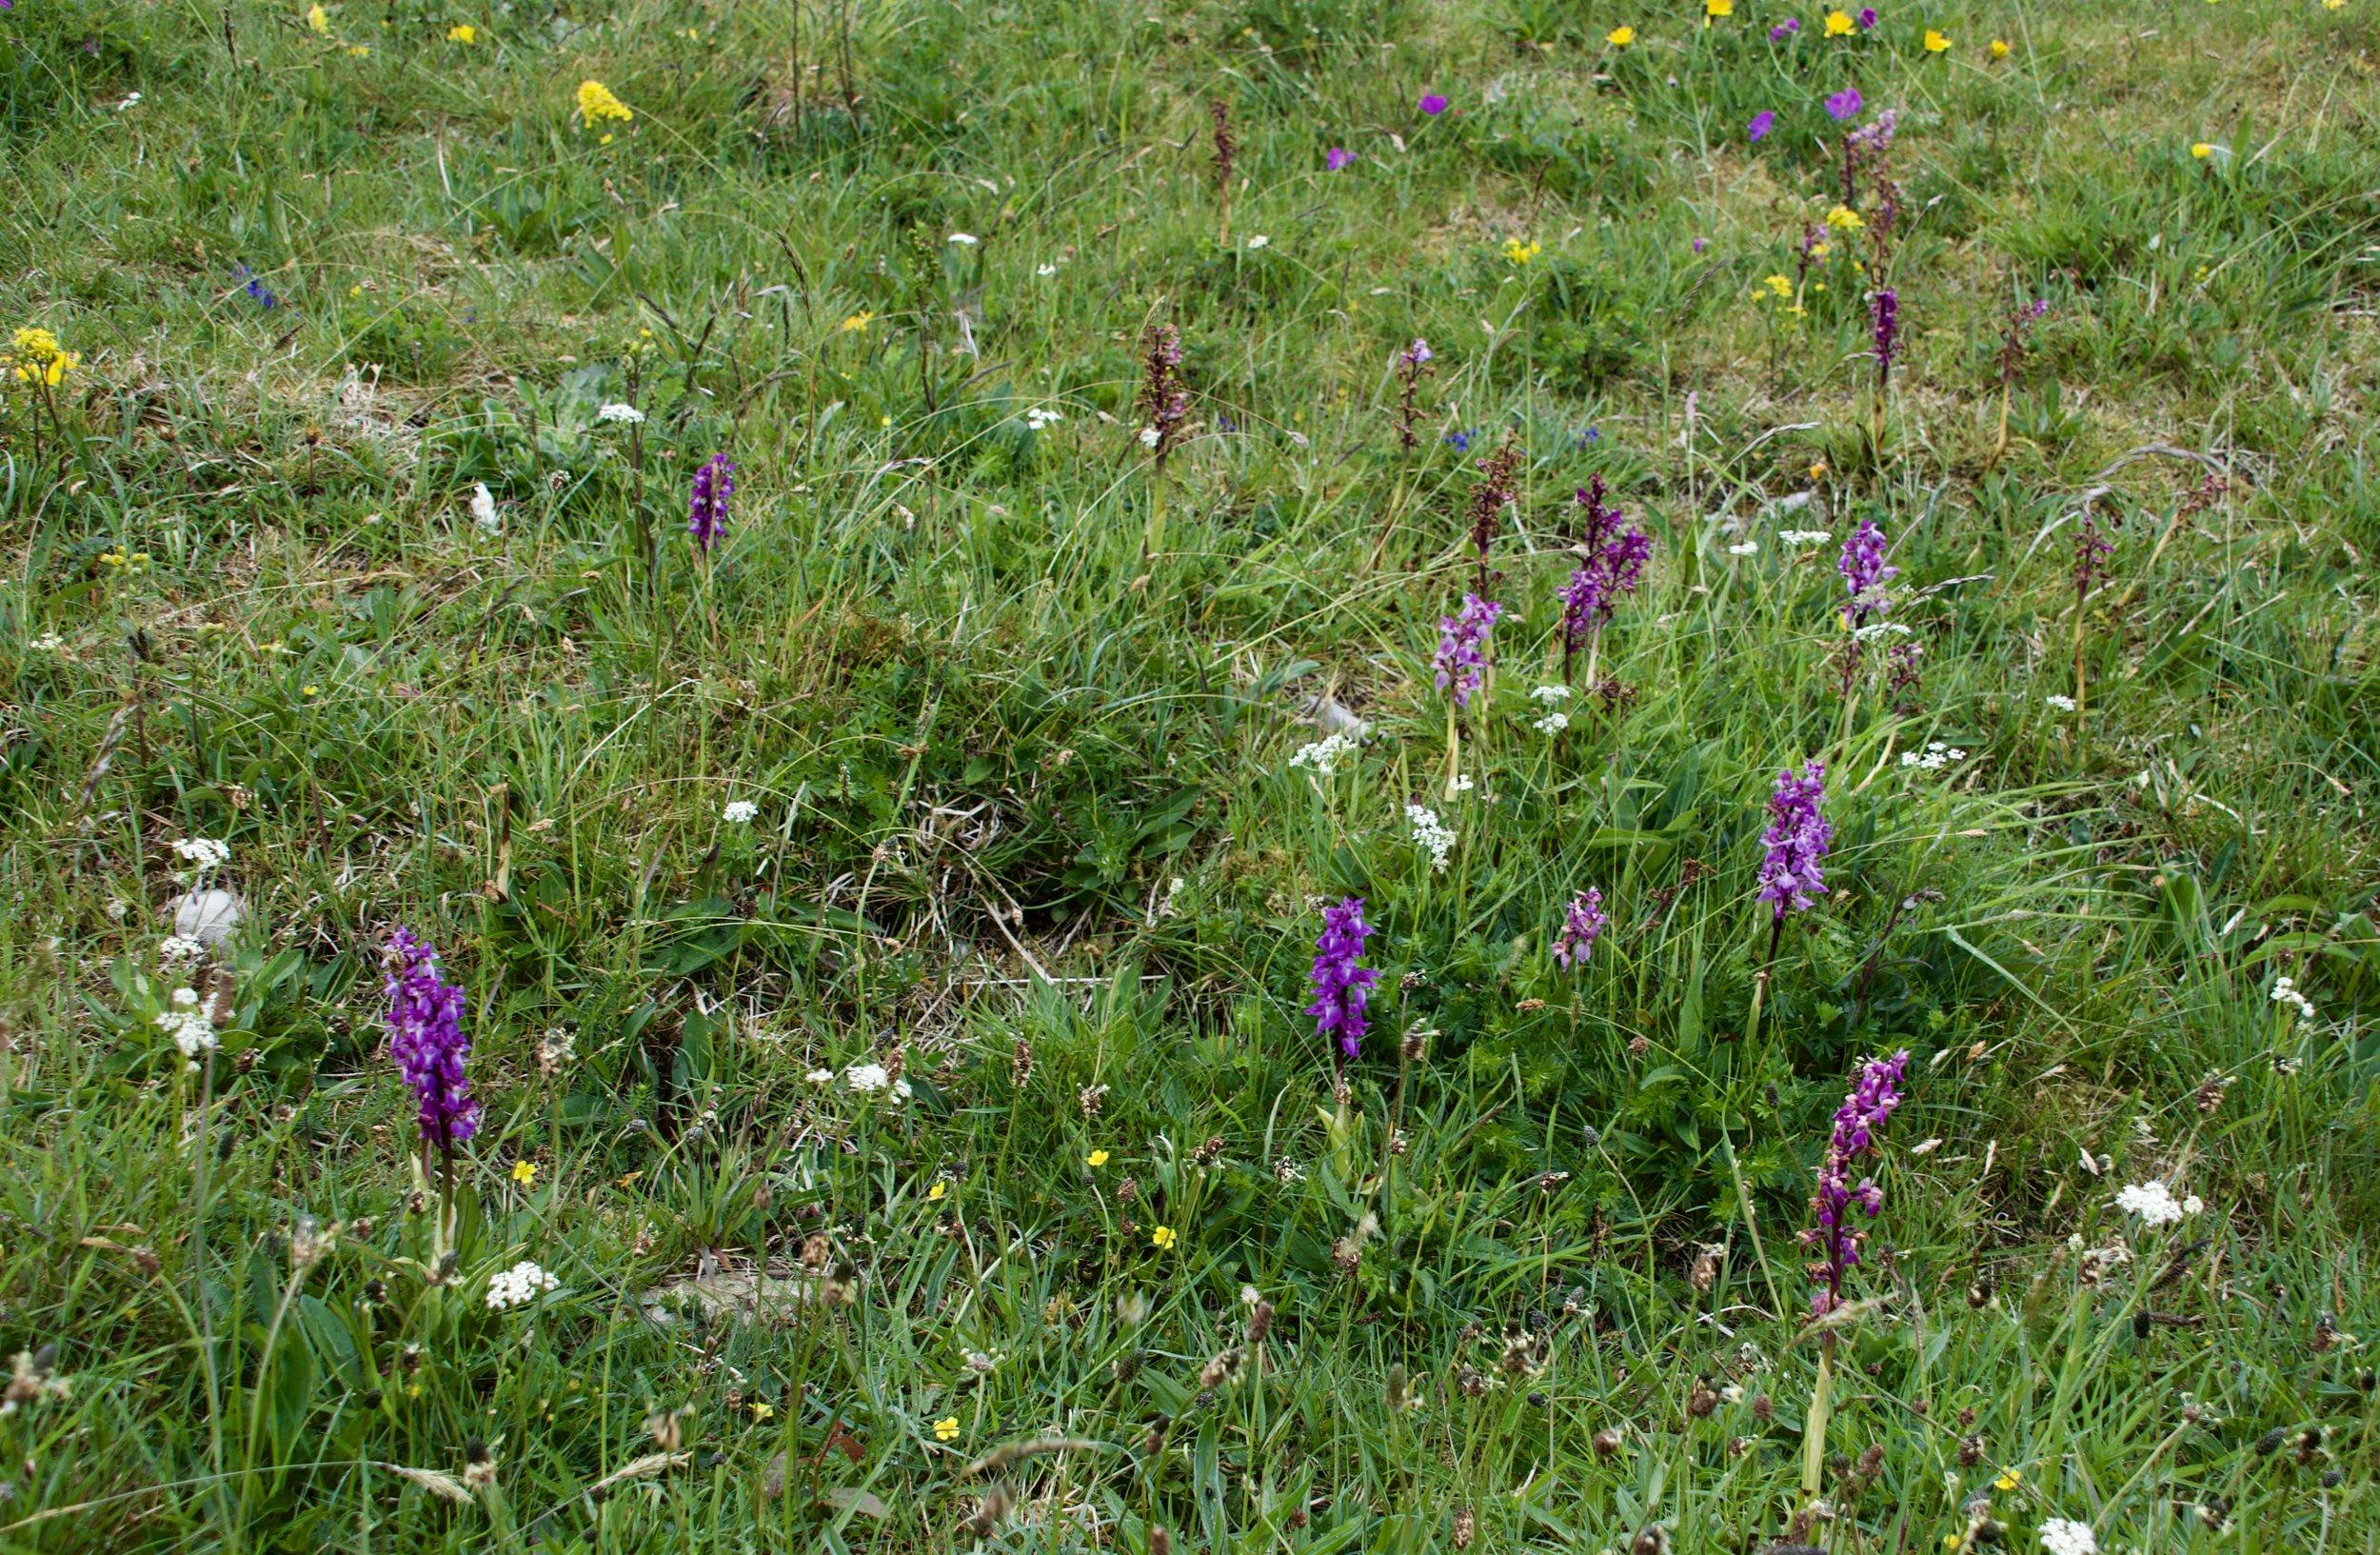 Wild Orchids in the Burren  Photo by Susan Izard